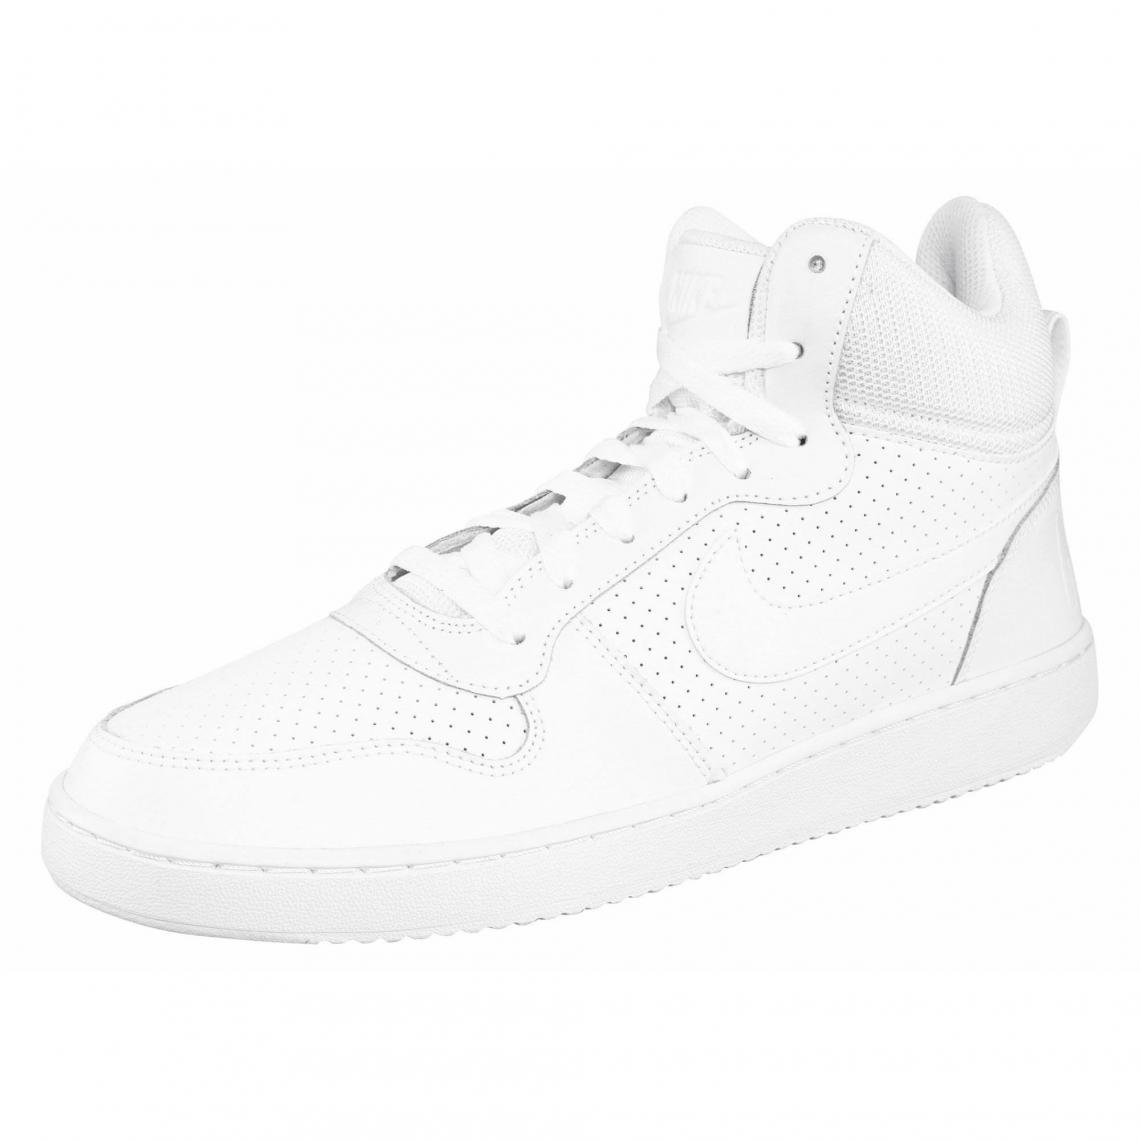 29fe11a46def Nike Court Borough Mid chaussure semi-montante homme - Blanc - Blanc ...